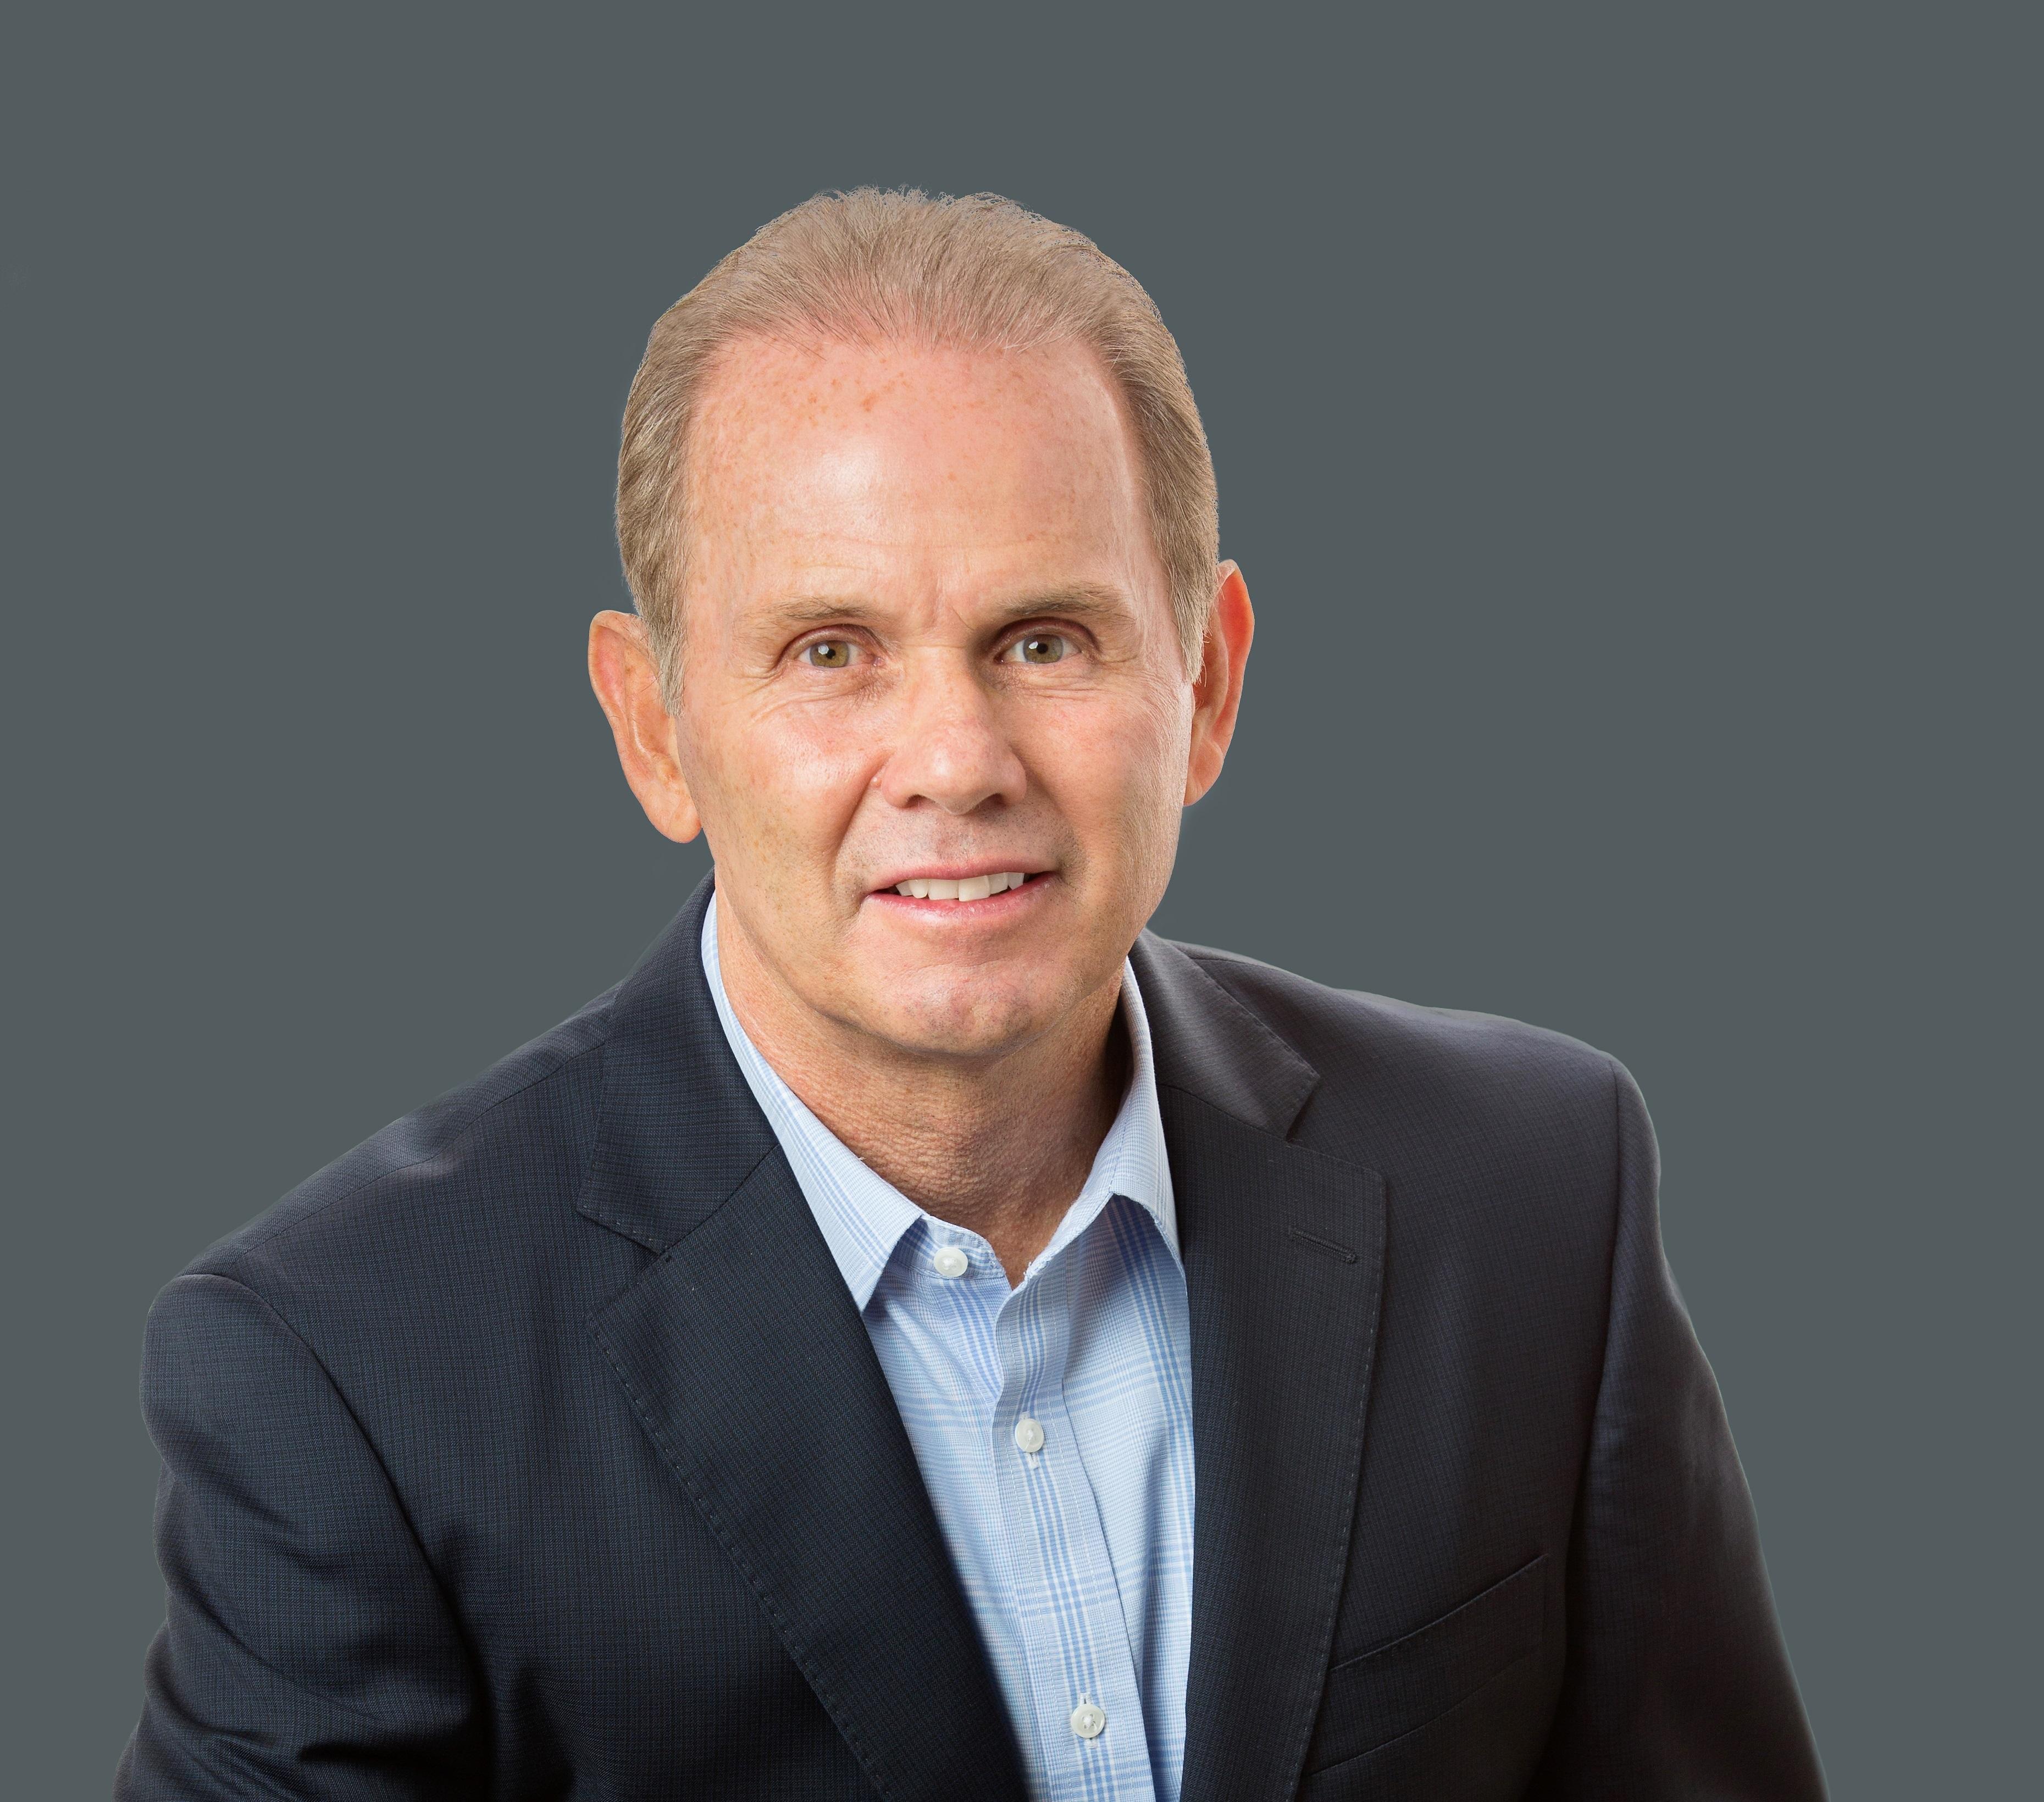 Mike Fernandez